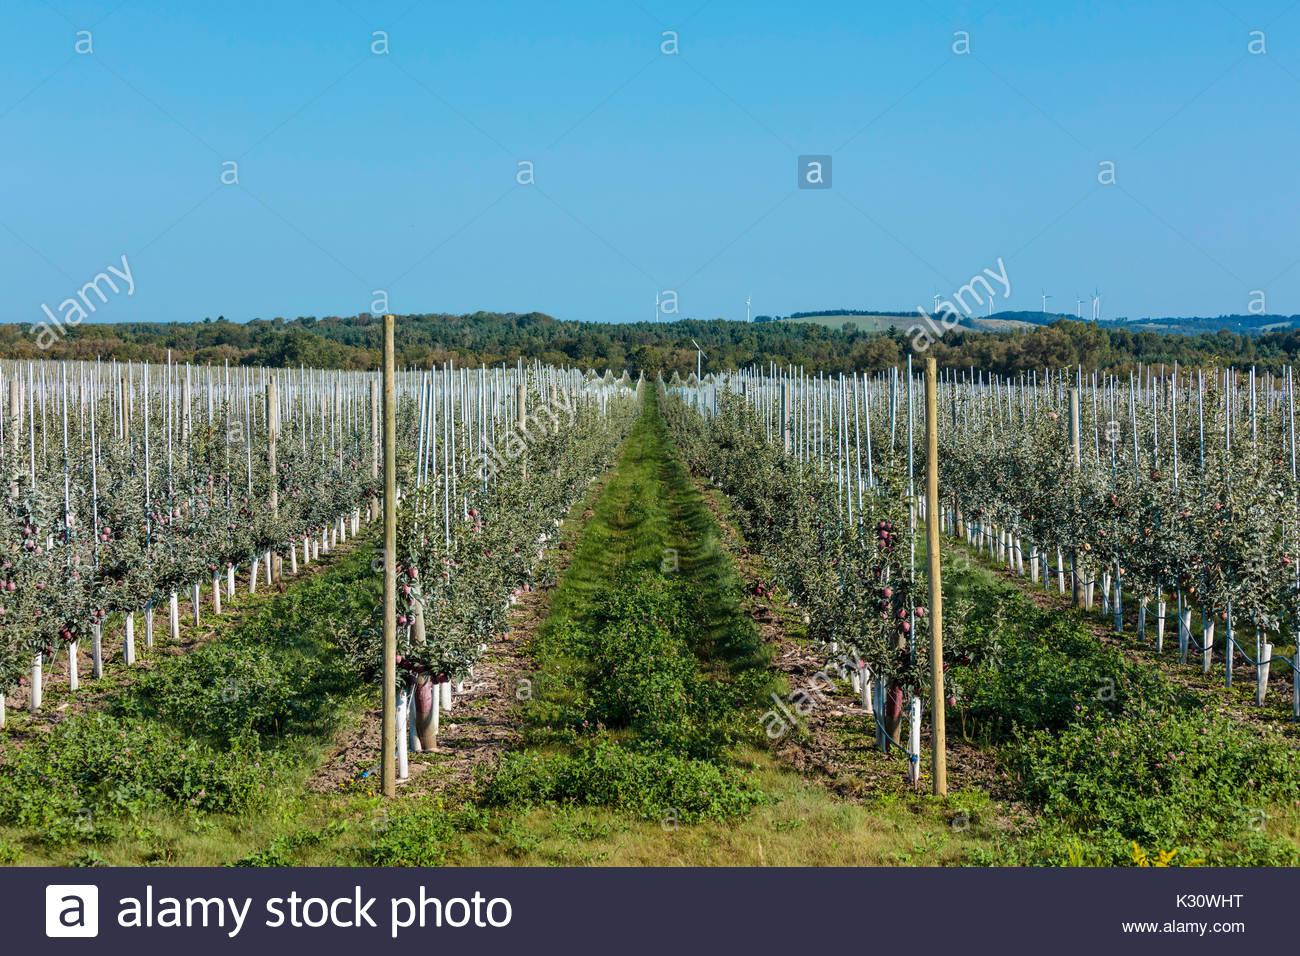 High density commercial apple orchard on trellises on farm near Bowmanville Ontario Canada - Stock Image